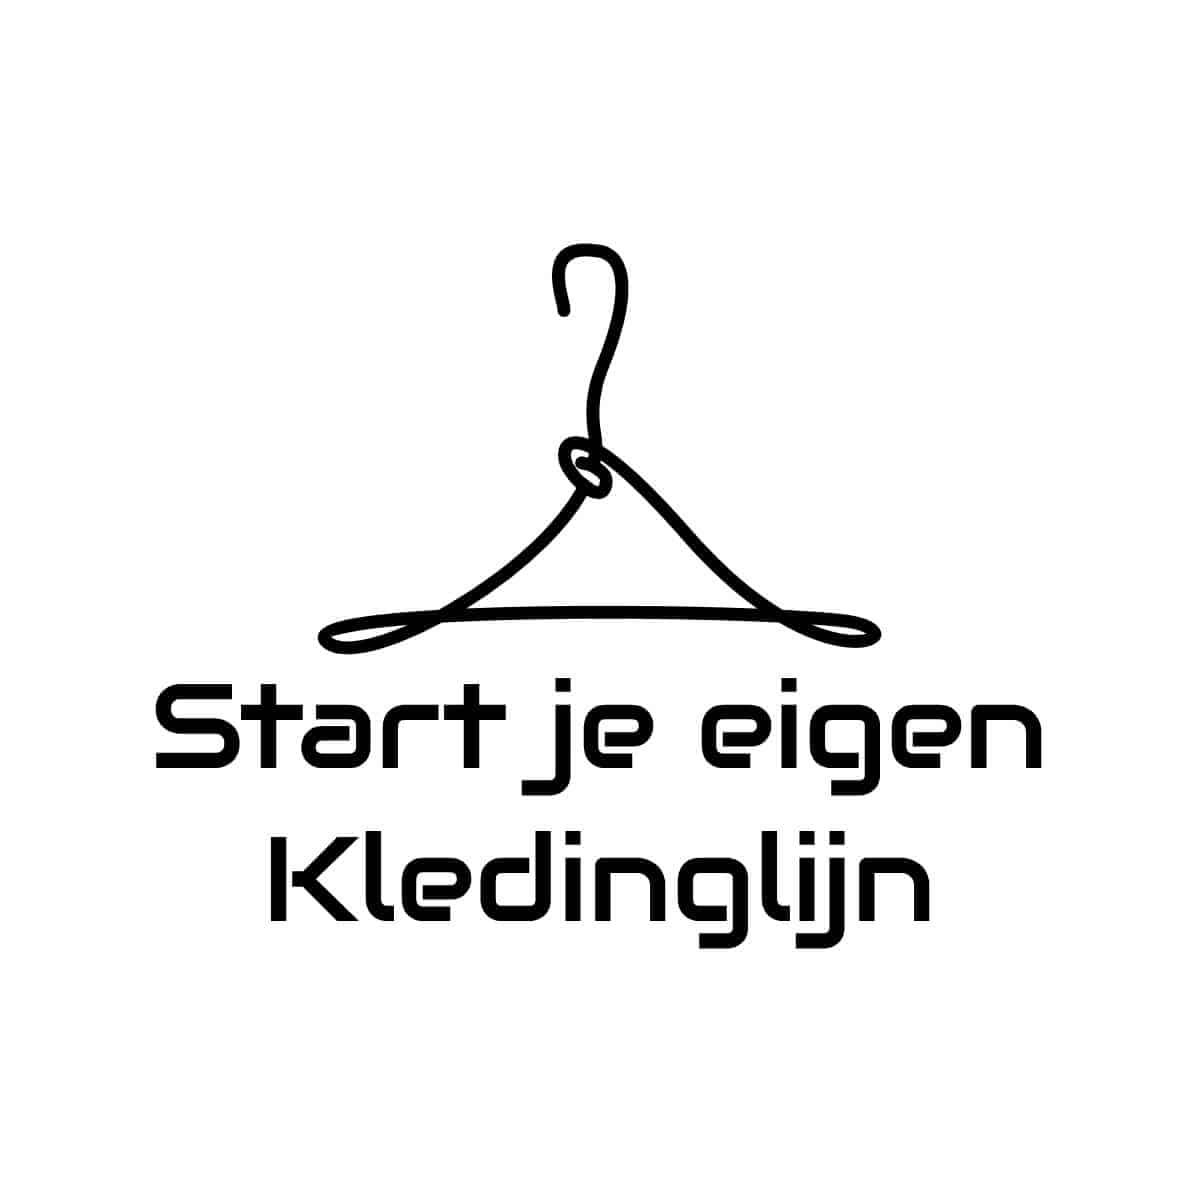 Start je eigen Kledinglijn